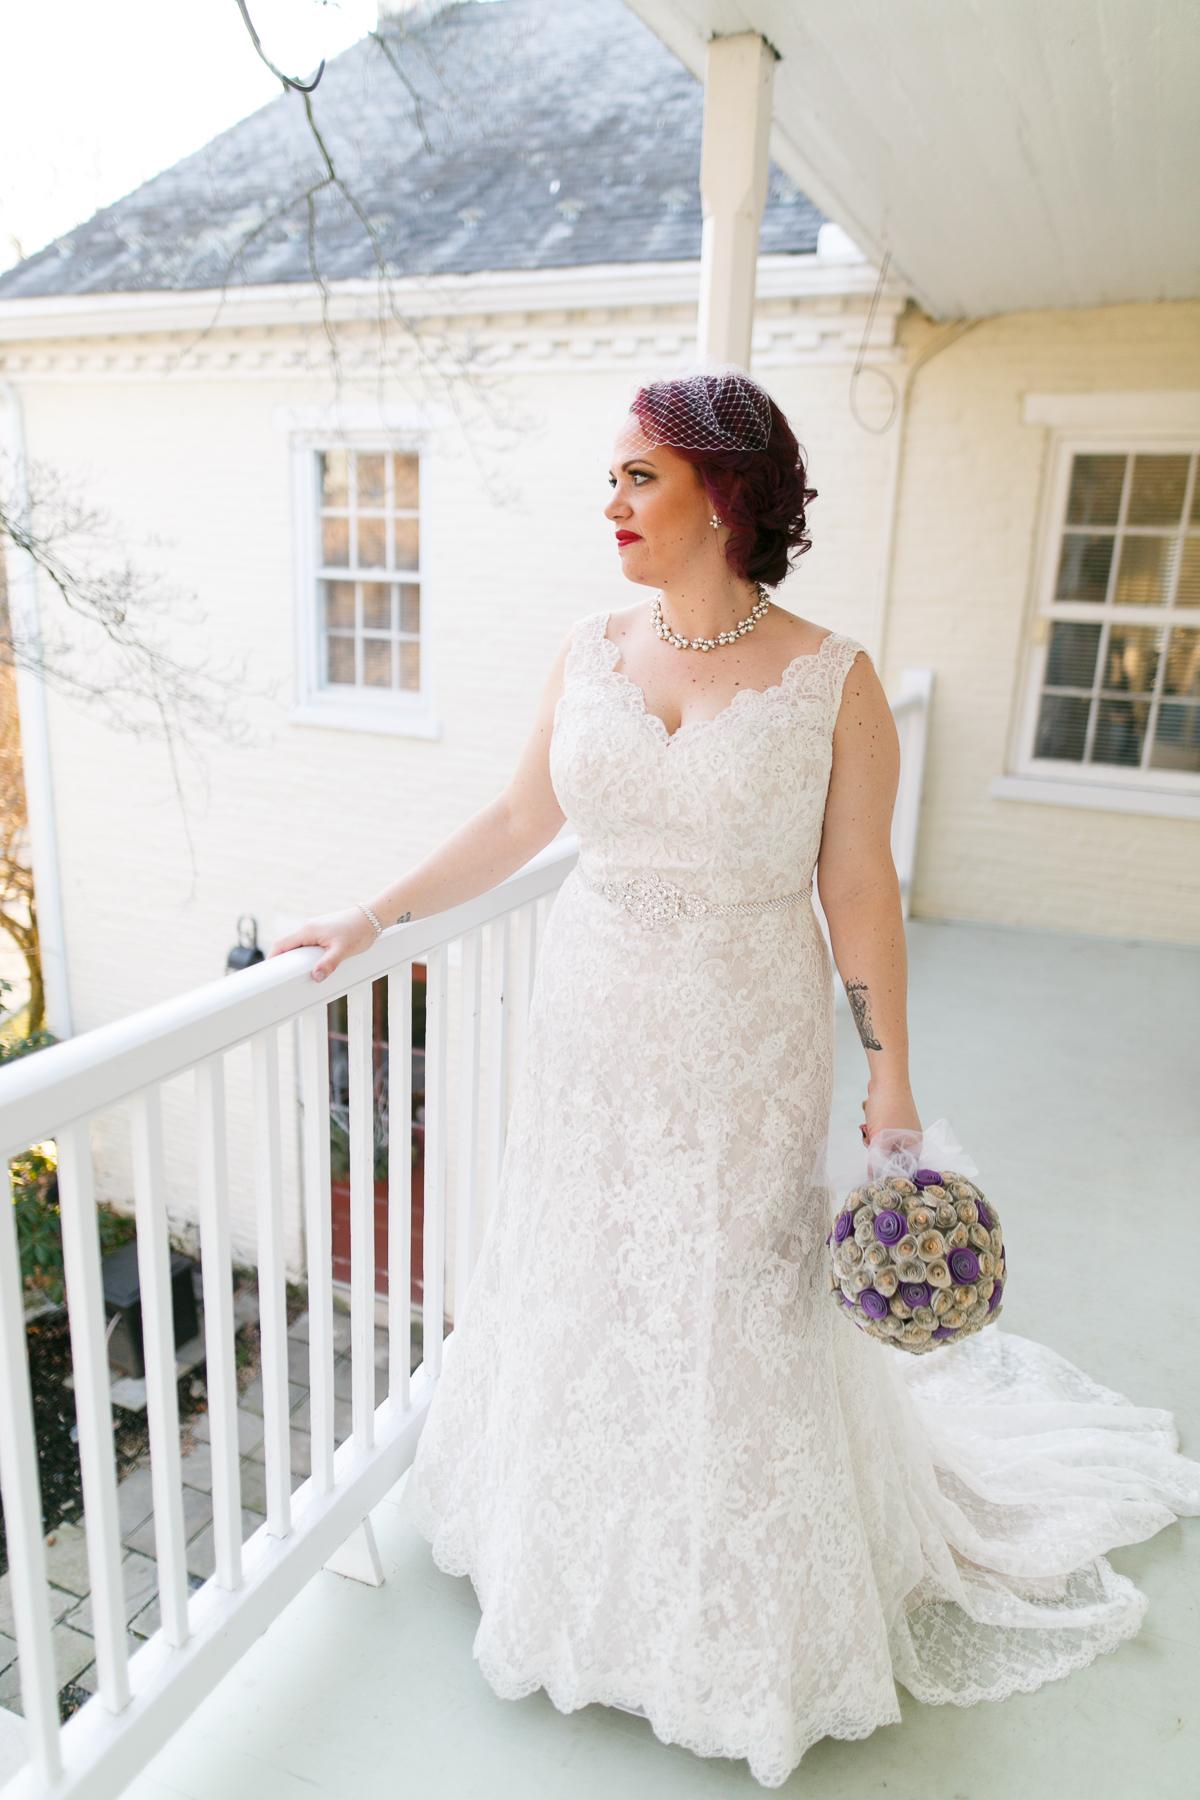 B&J Riverdale Manor Winter Wedding -86.jpg